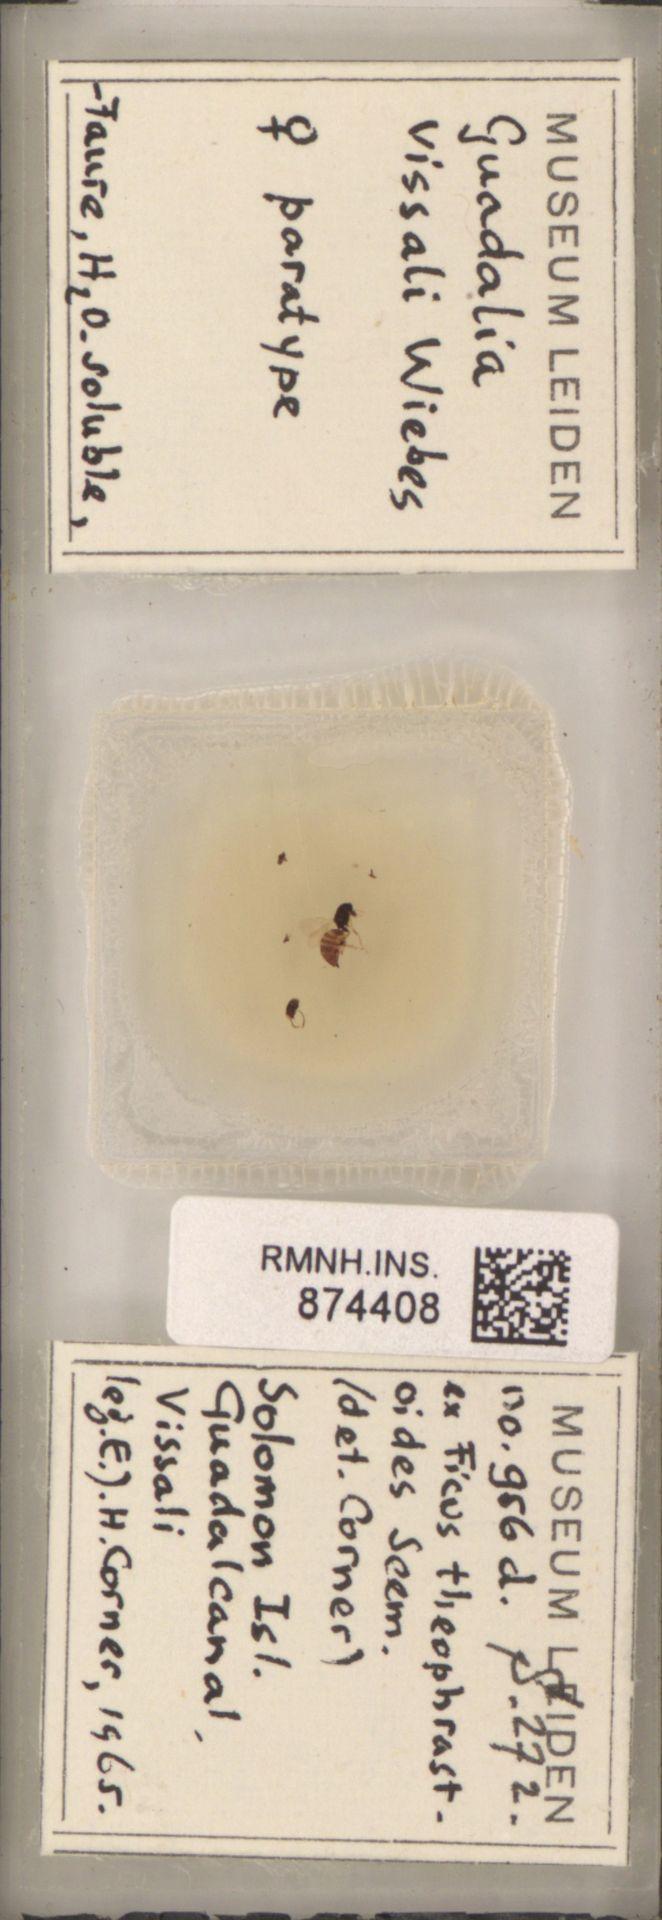 RMNH.INS.874408 | Guadalia vissali Wiebes